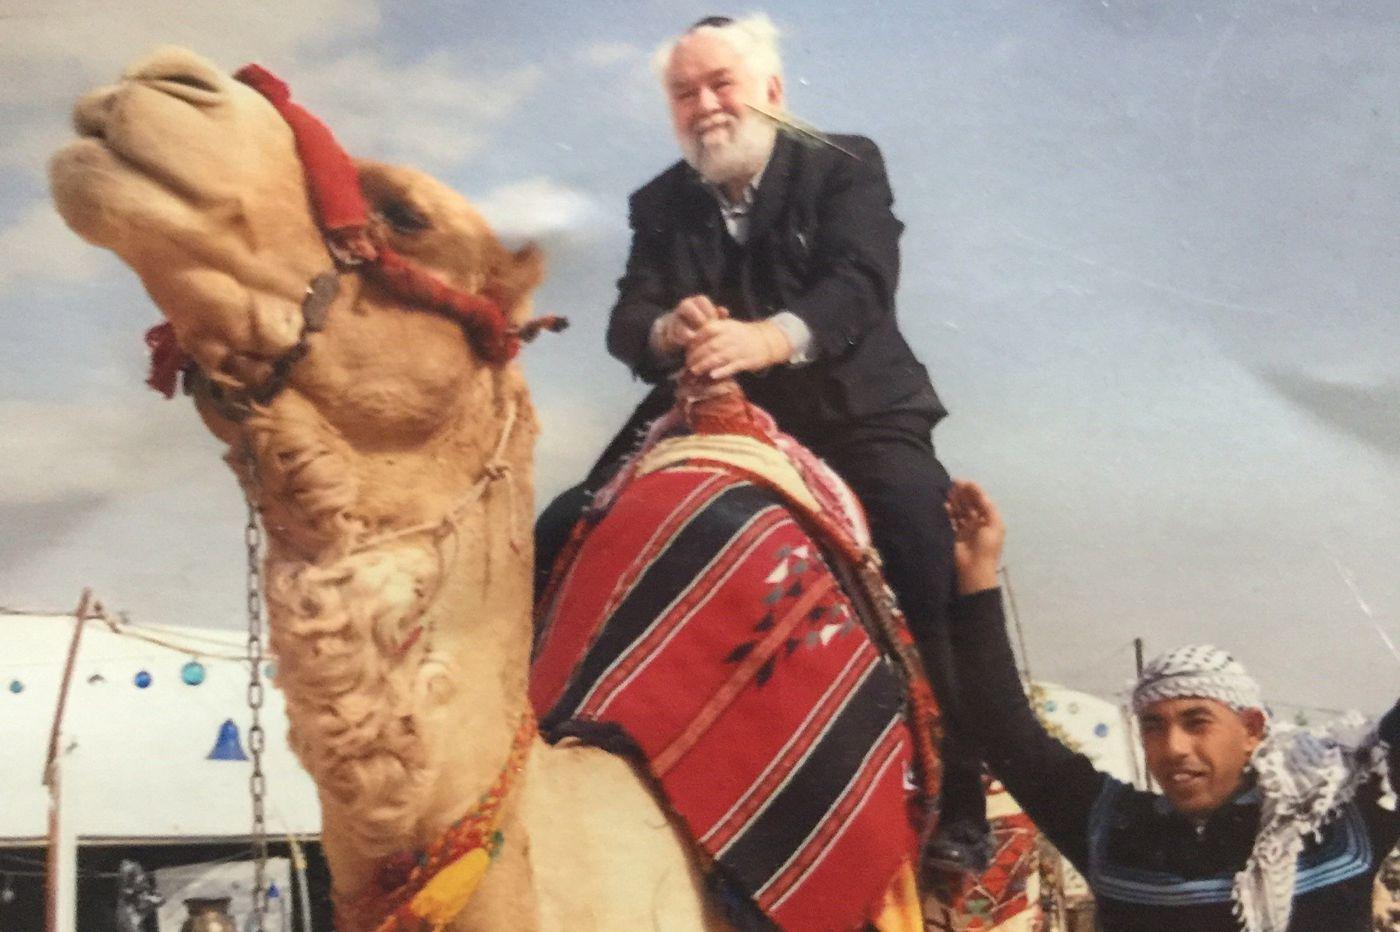 Avraham Shlomo MacConnell, 72, was a veteran and police officer